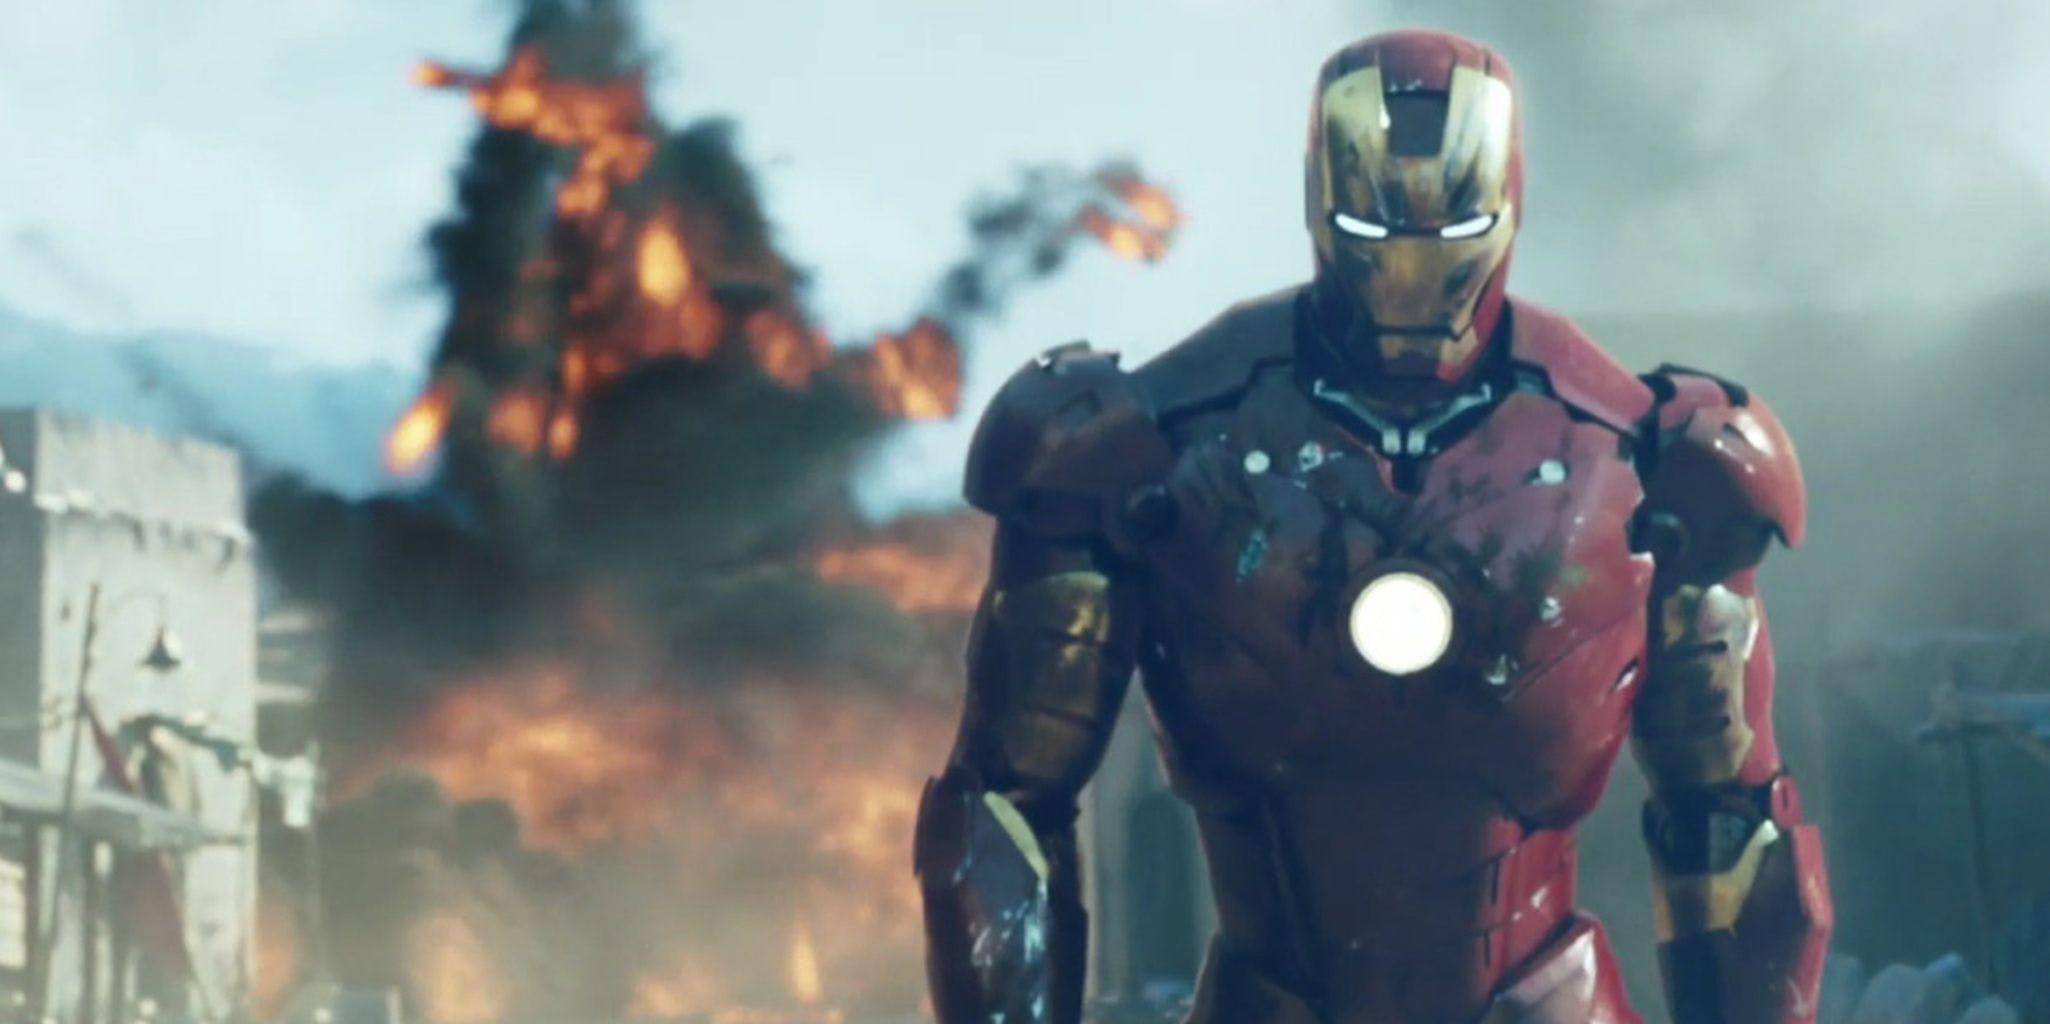 Best movies on Hulu: Iron Man